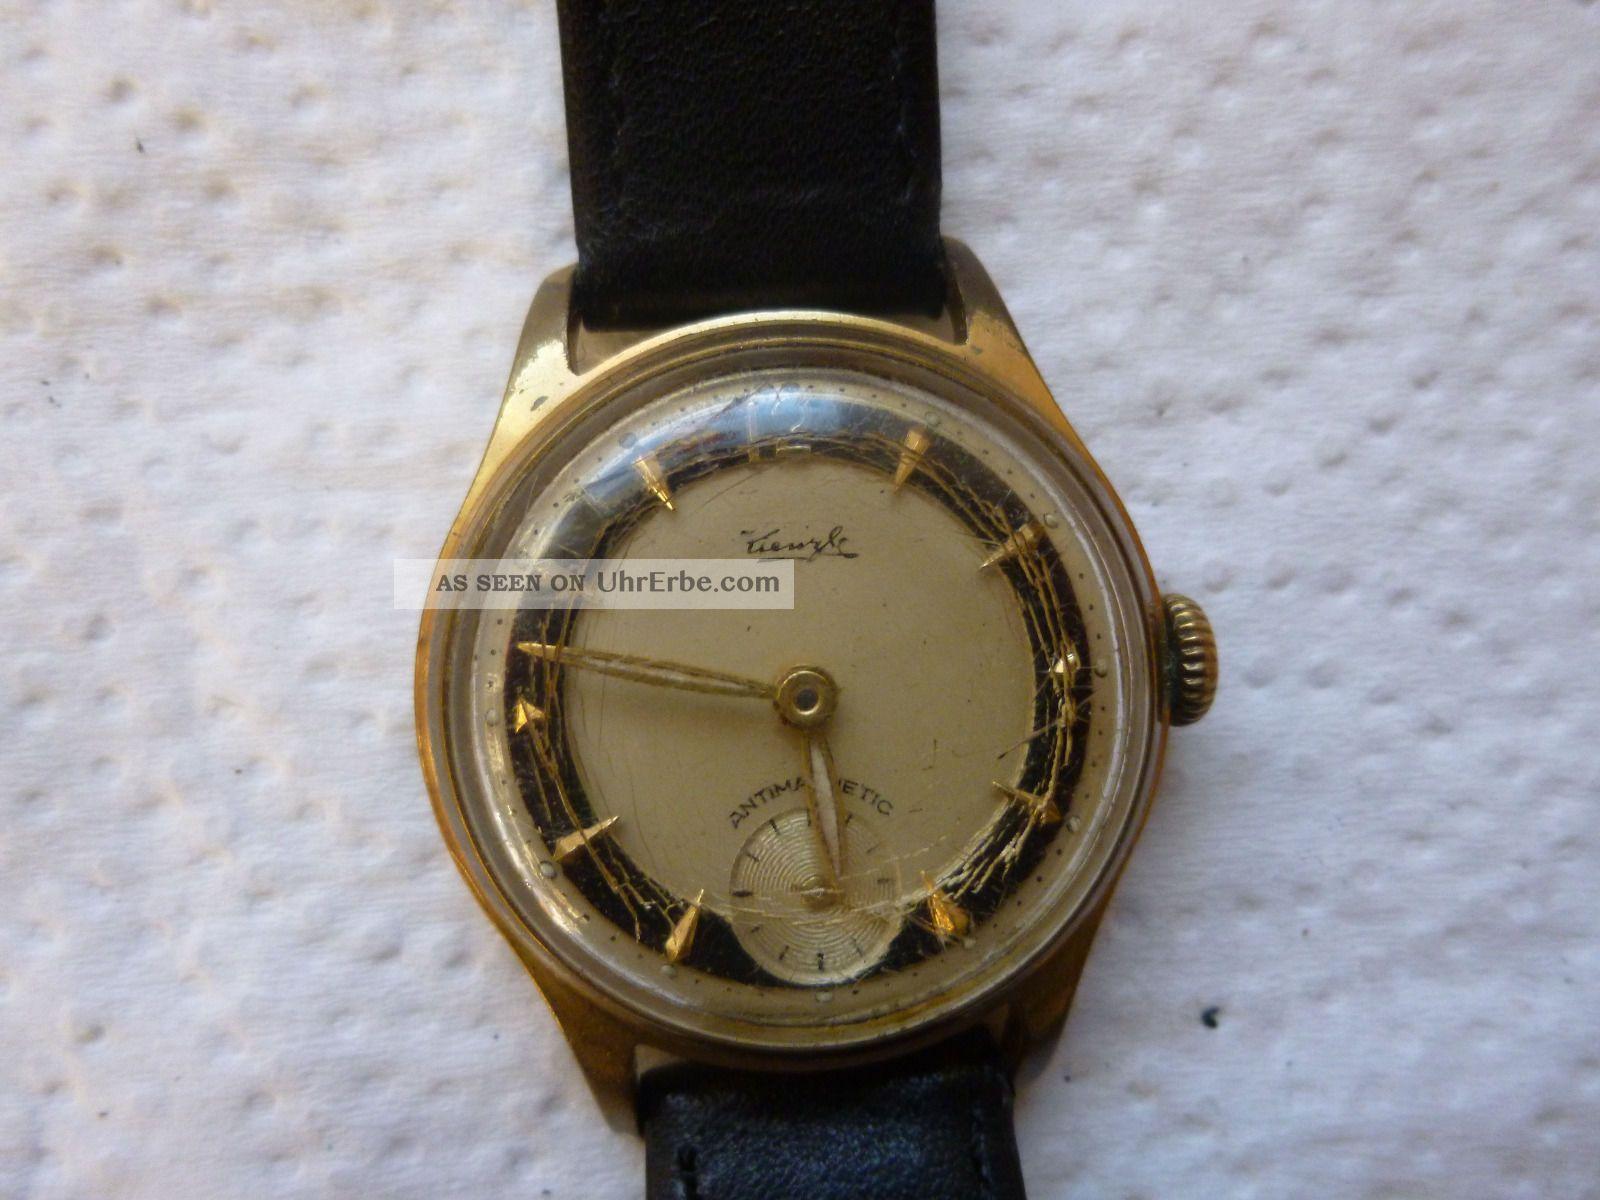 Armbanduhr Aus Papas Sammlung Nr.  16 Kienzle Funktion Mindes 12 Stunden Armbanduhren Bild